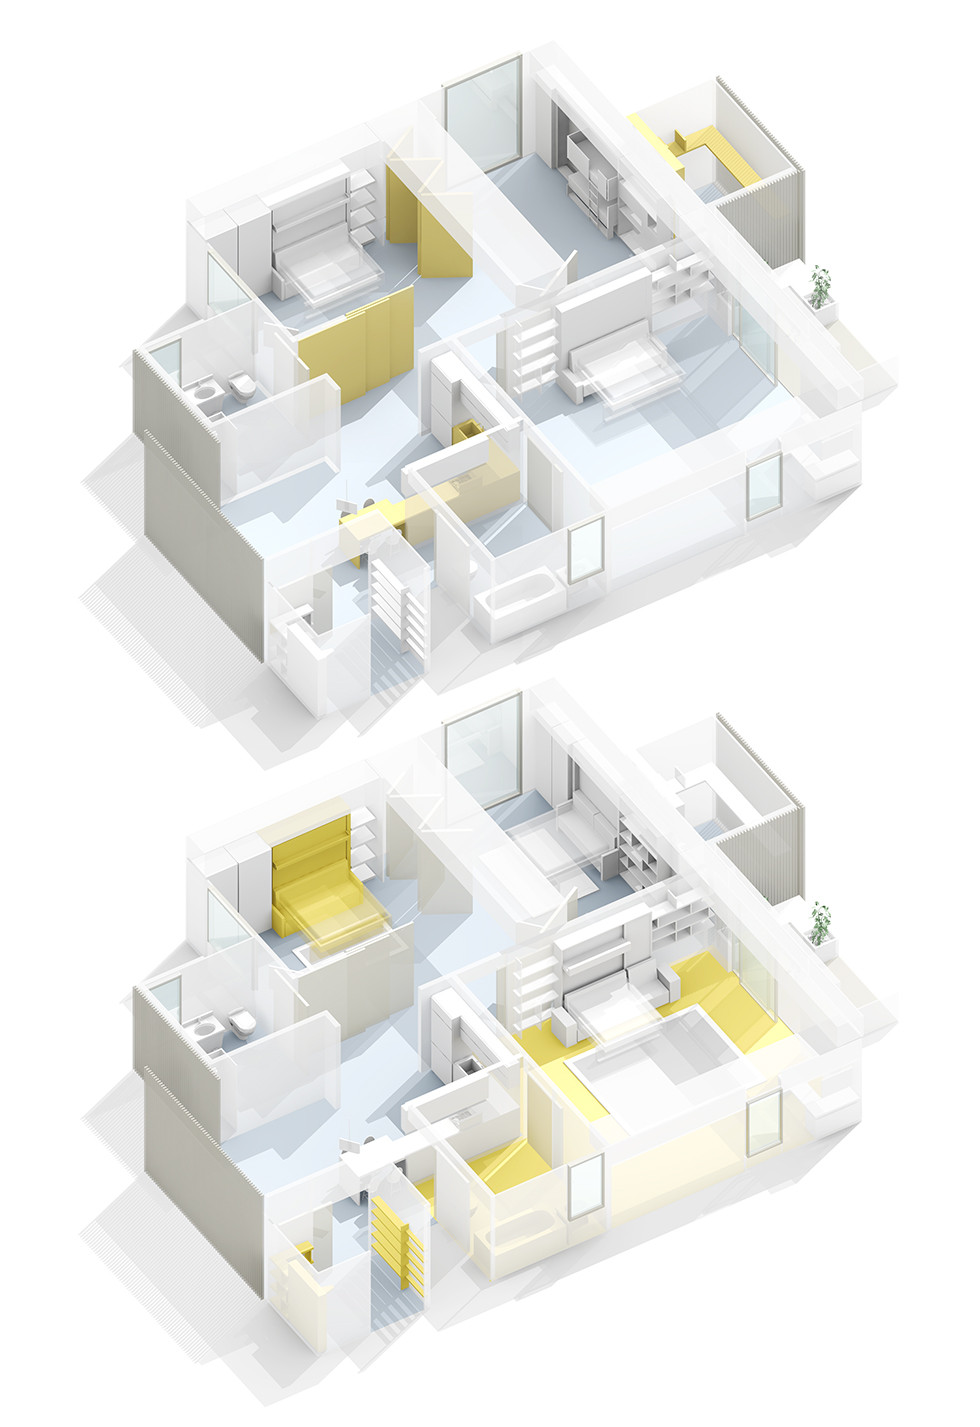 Modular interiors  -Dwell-